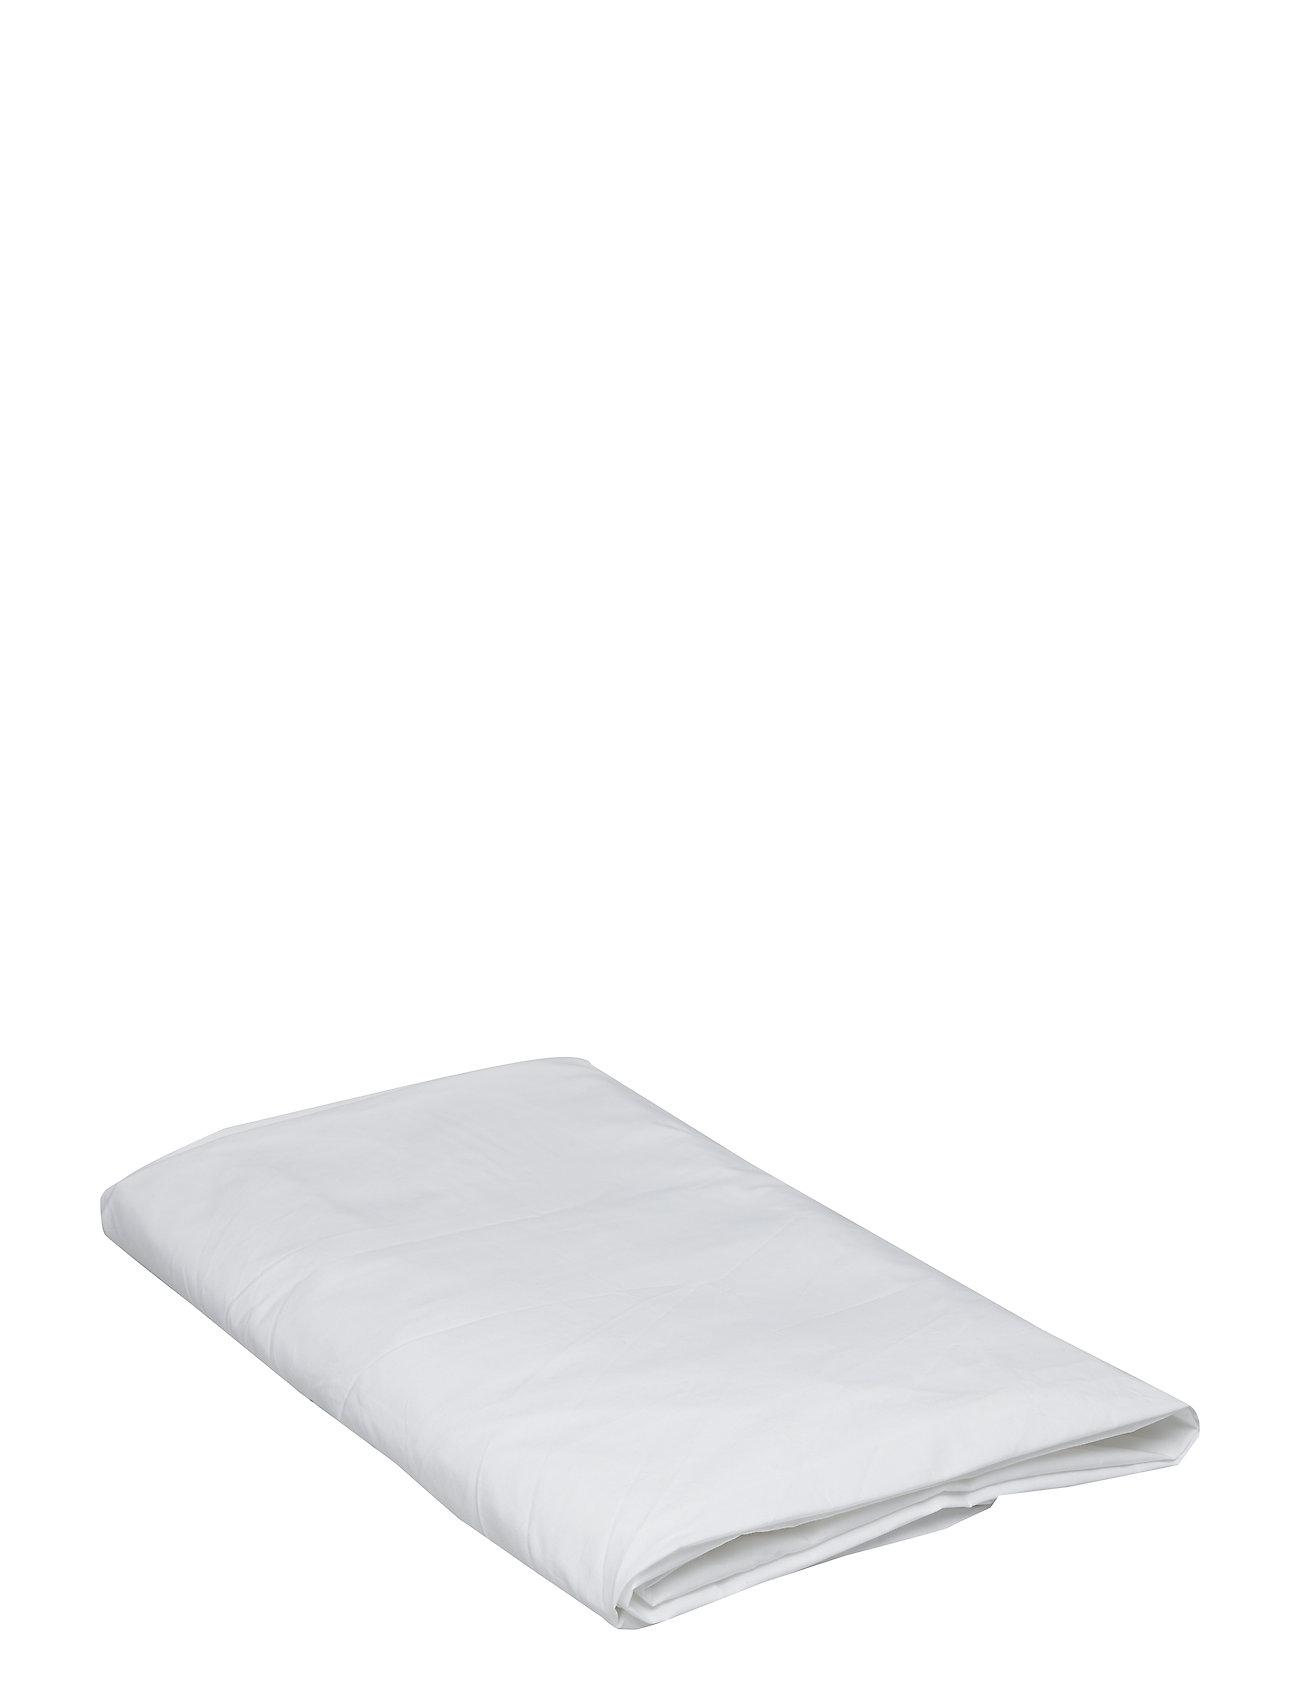 Gripsholm ENVELOPE SHEET ECO PERCALE - WHITE